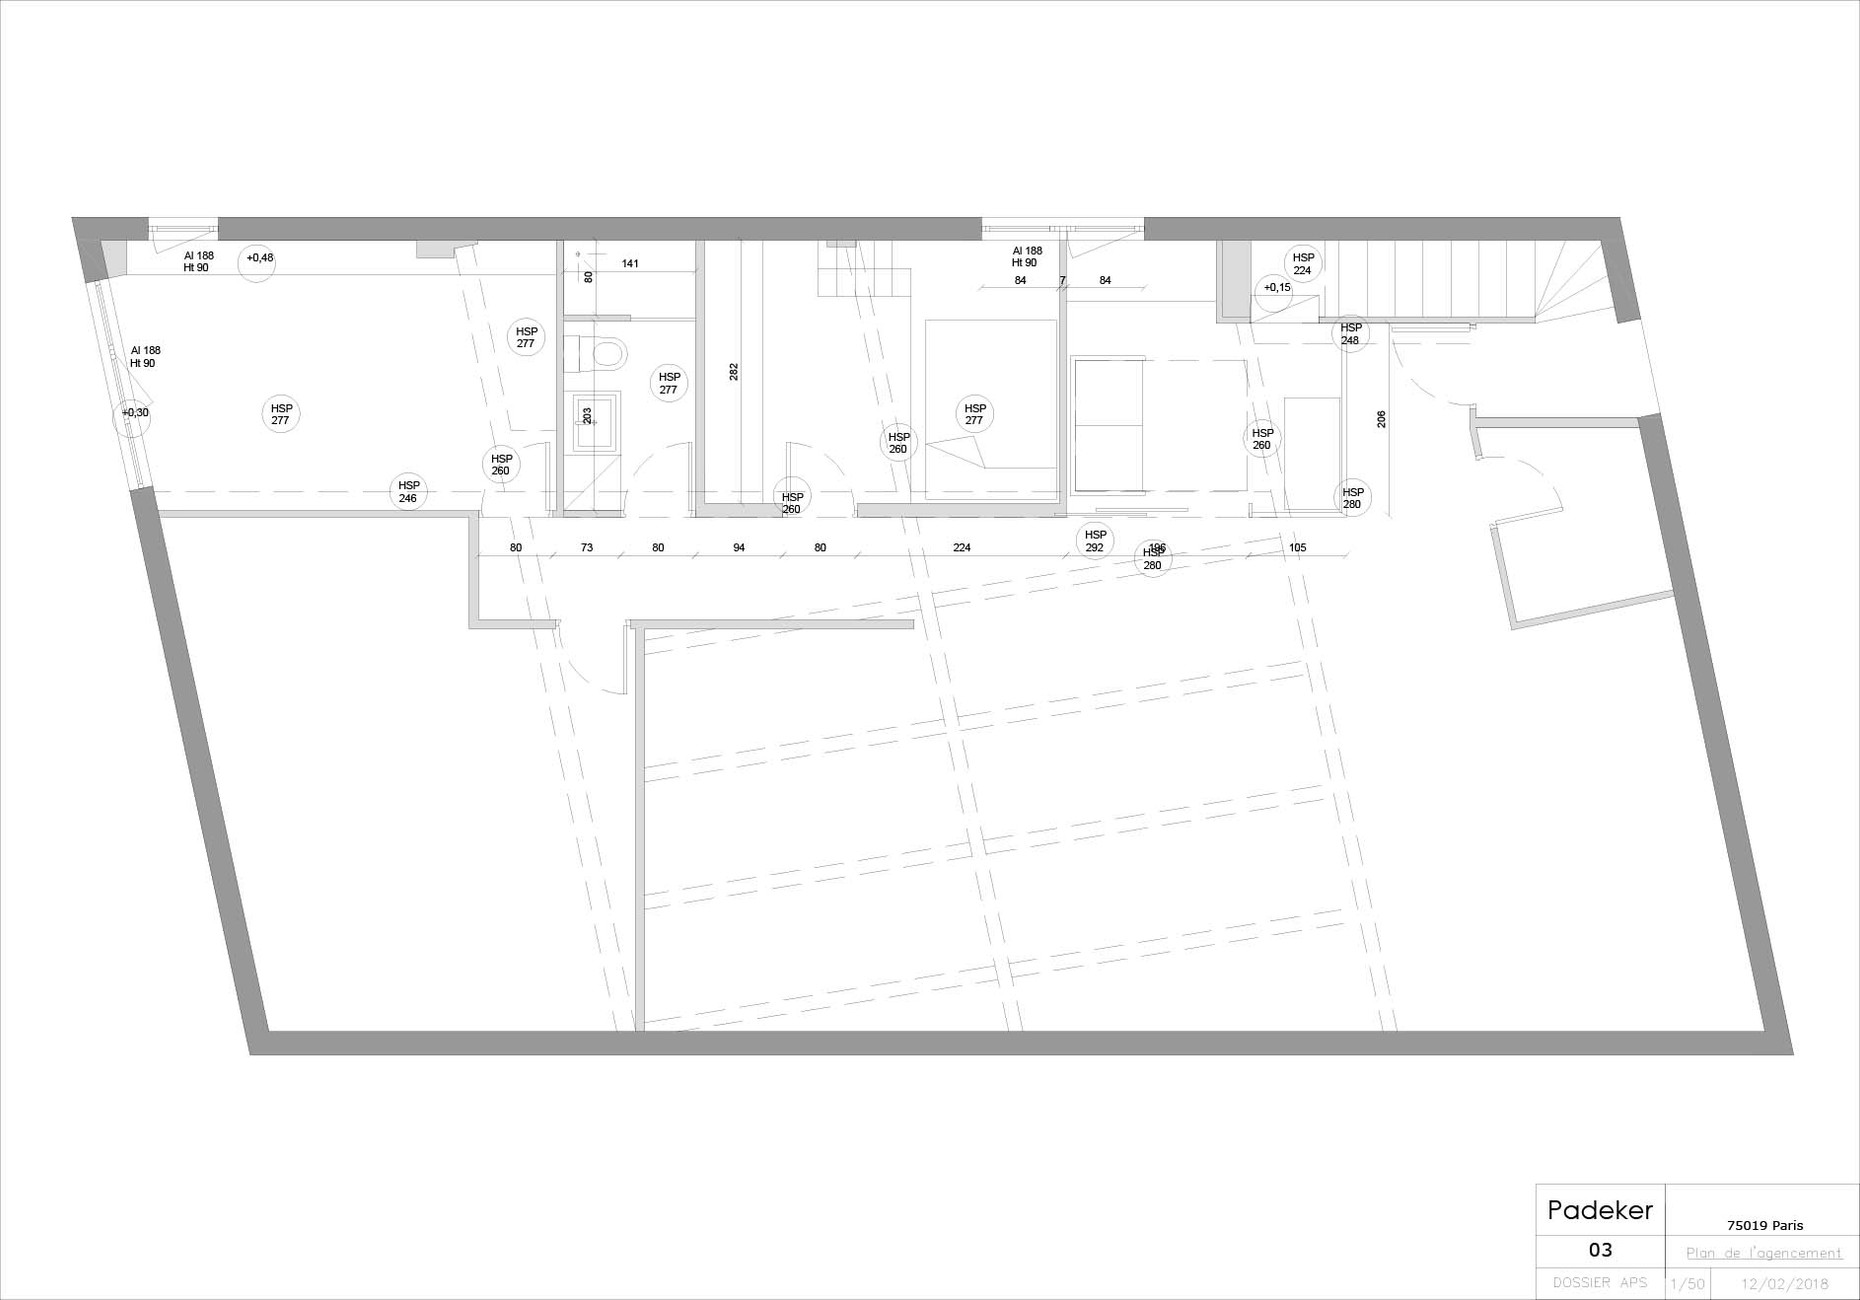 Projet loft plan de l'agencement.jpg